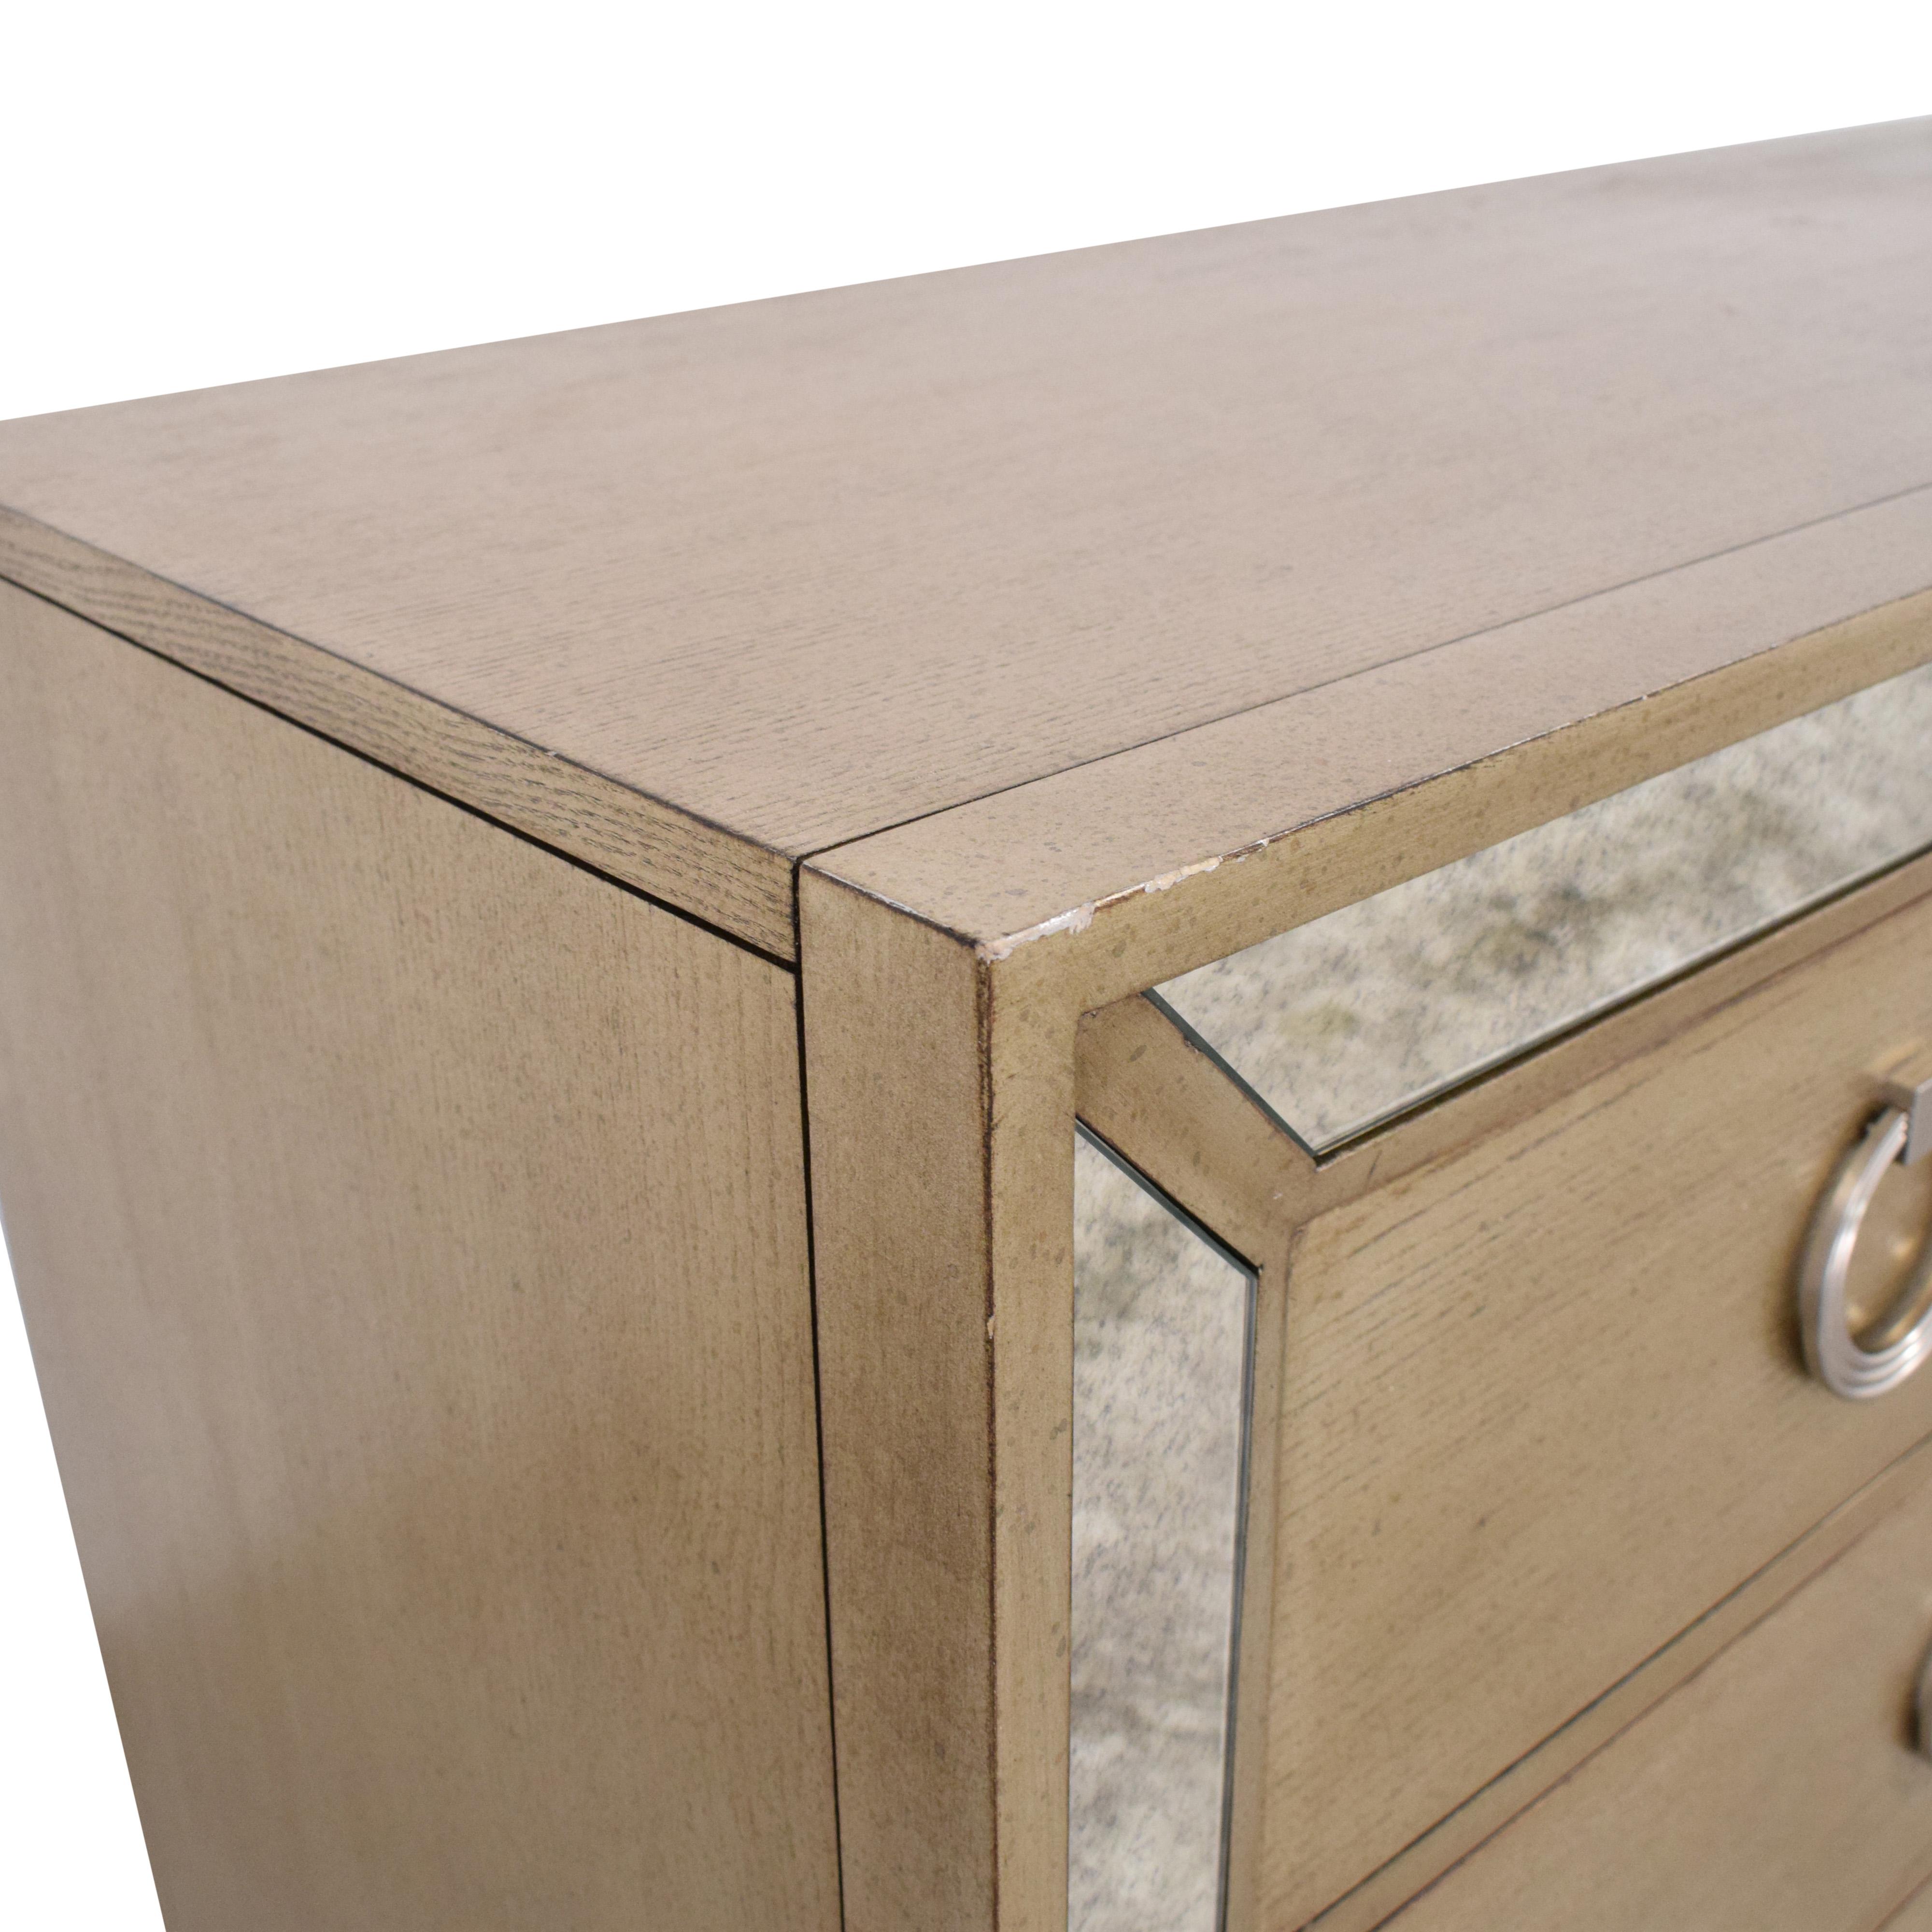 Macy's Macy's Ailey 8 Drawer Dresser